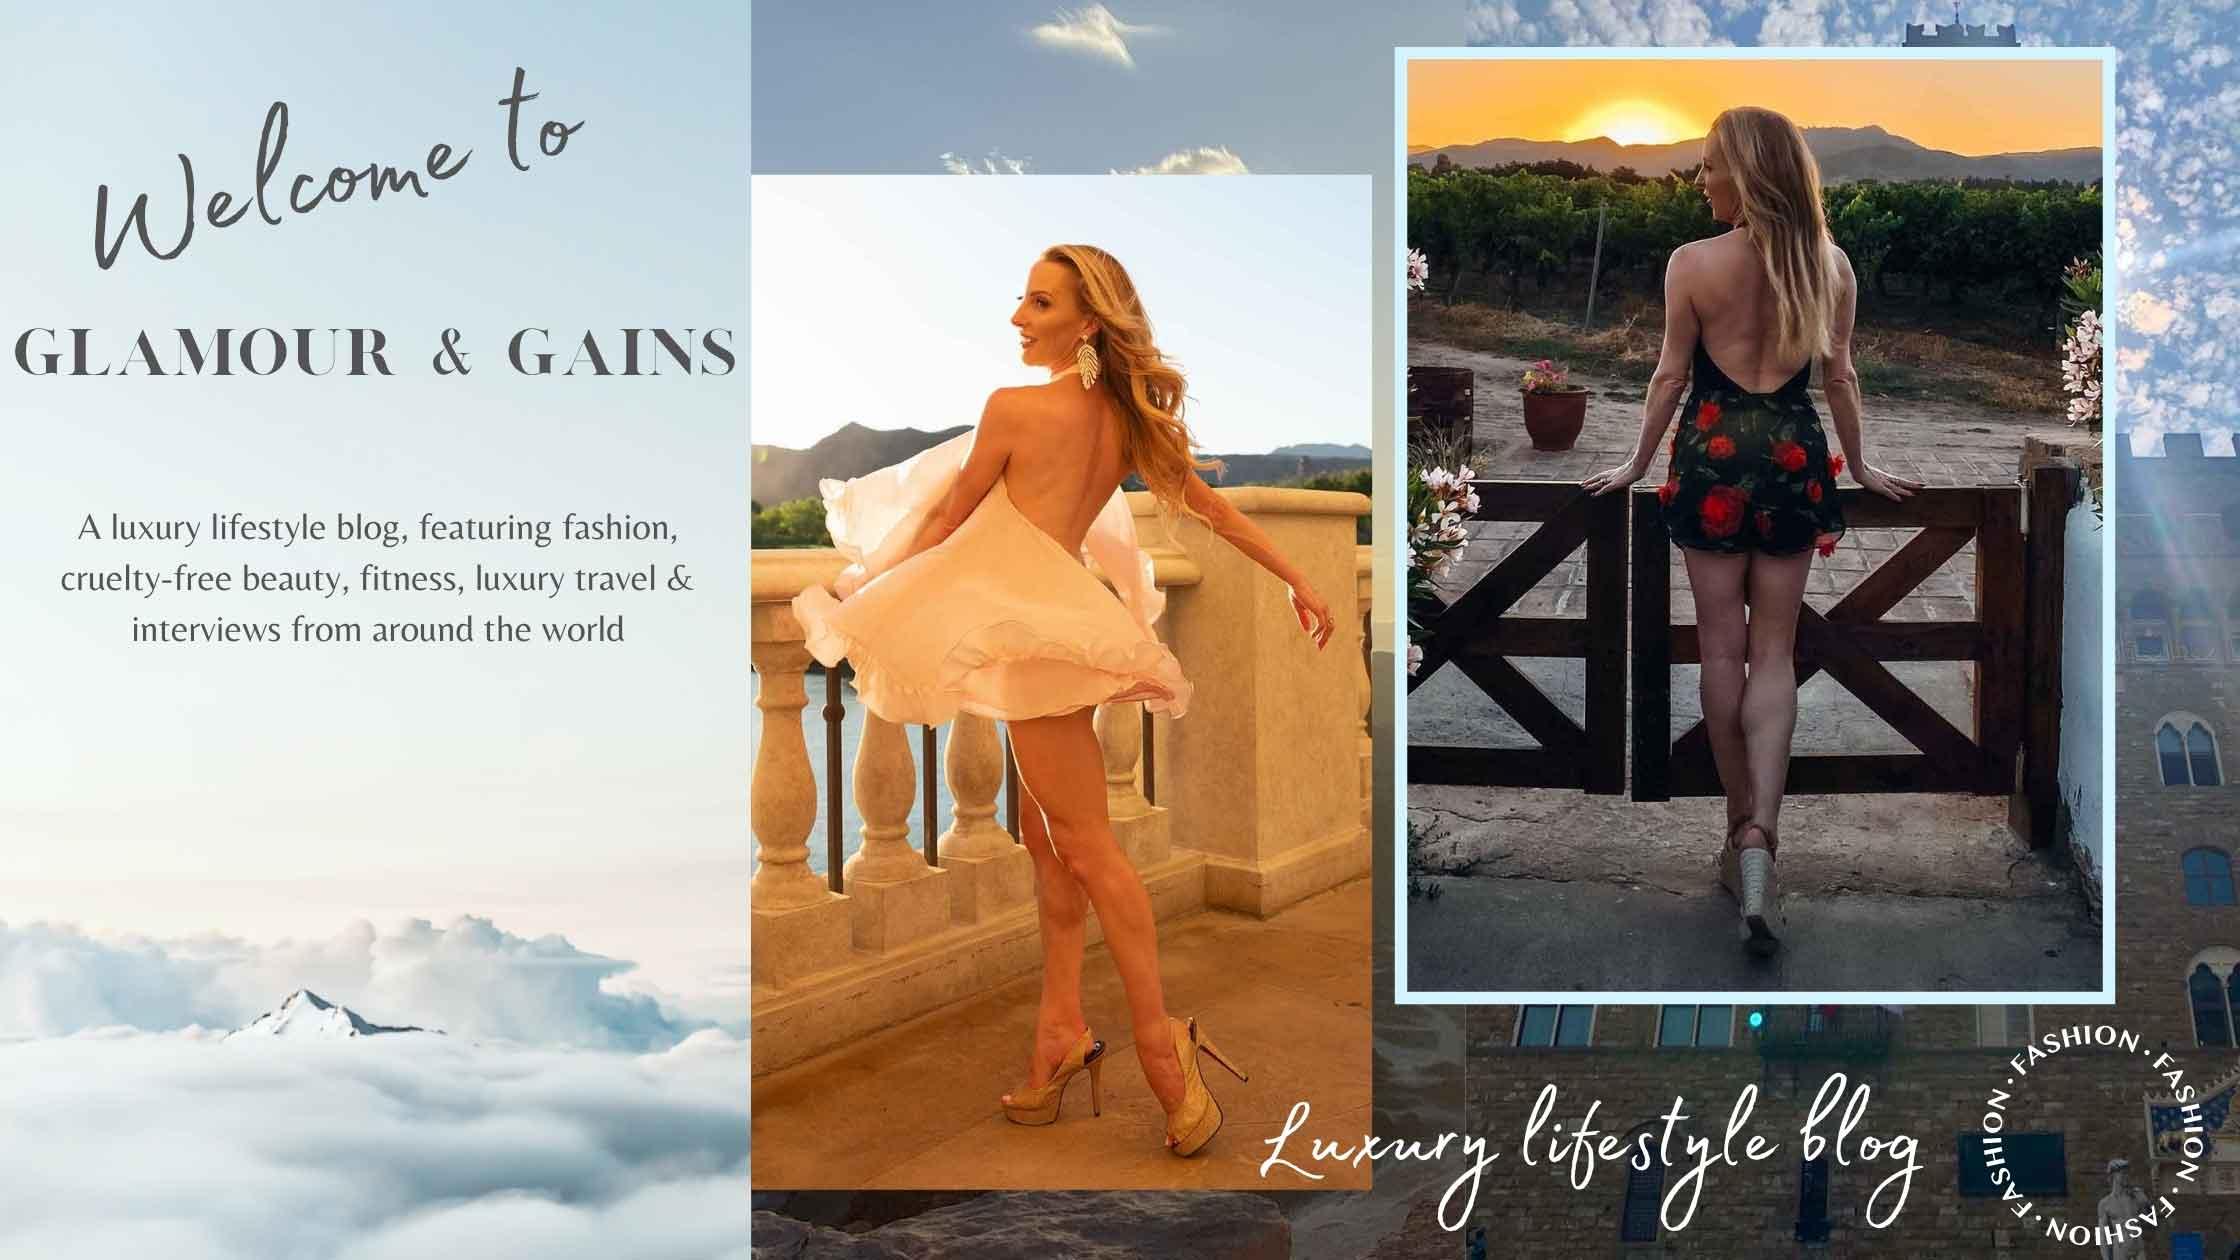 luxury lifestyle blog glamour gains banner